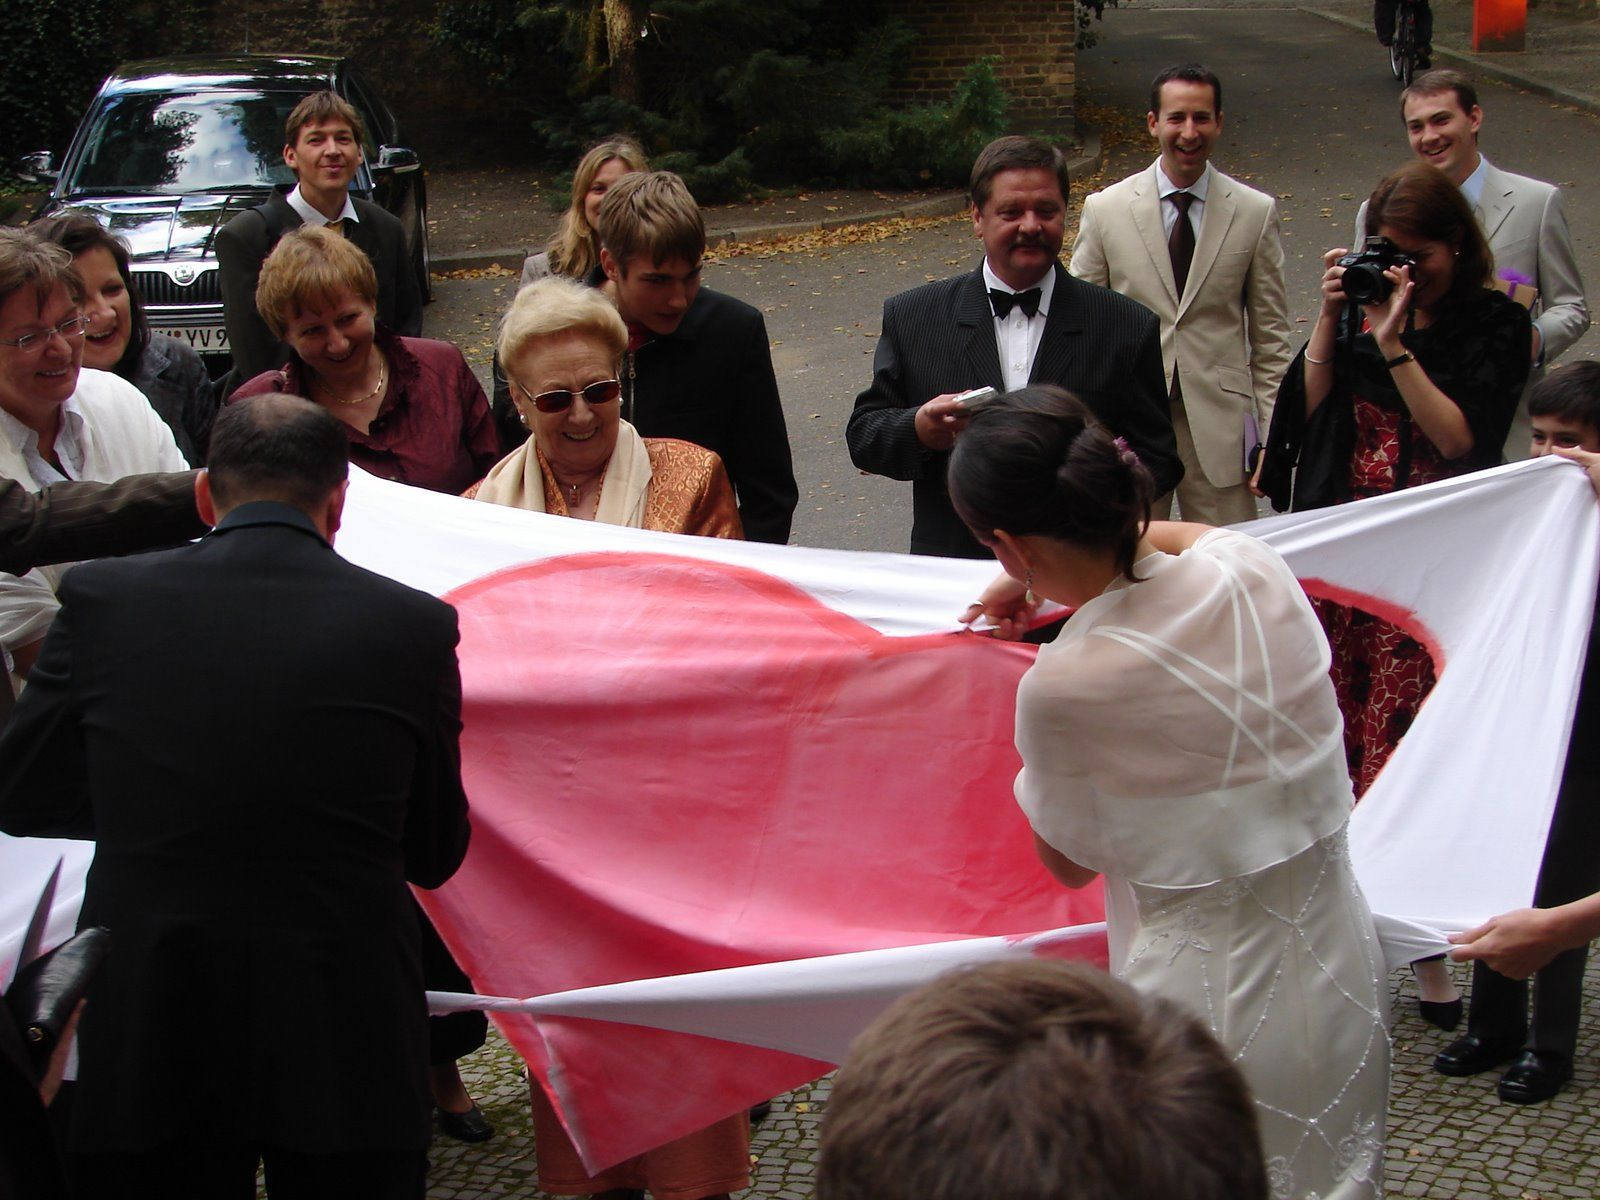 German Wedding Gift Ideas: Wedding Games. Games